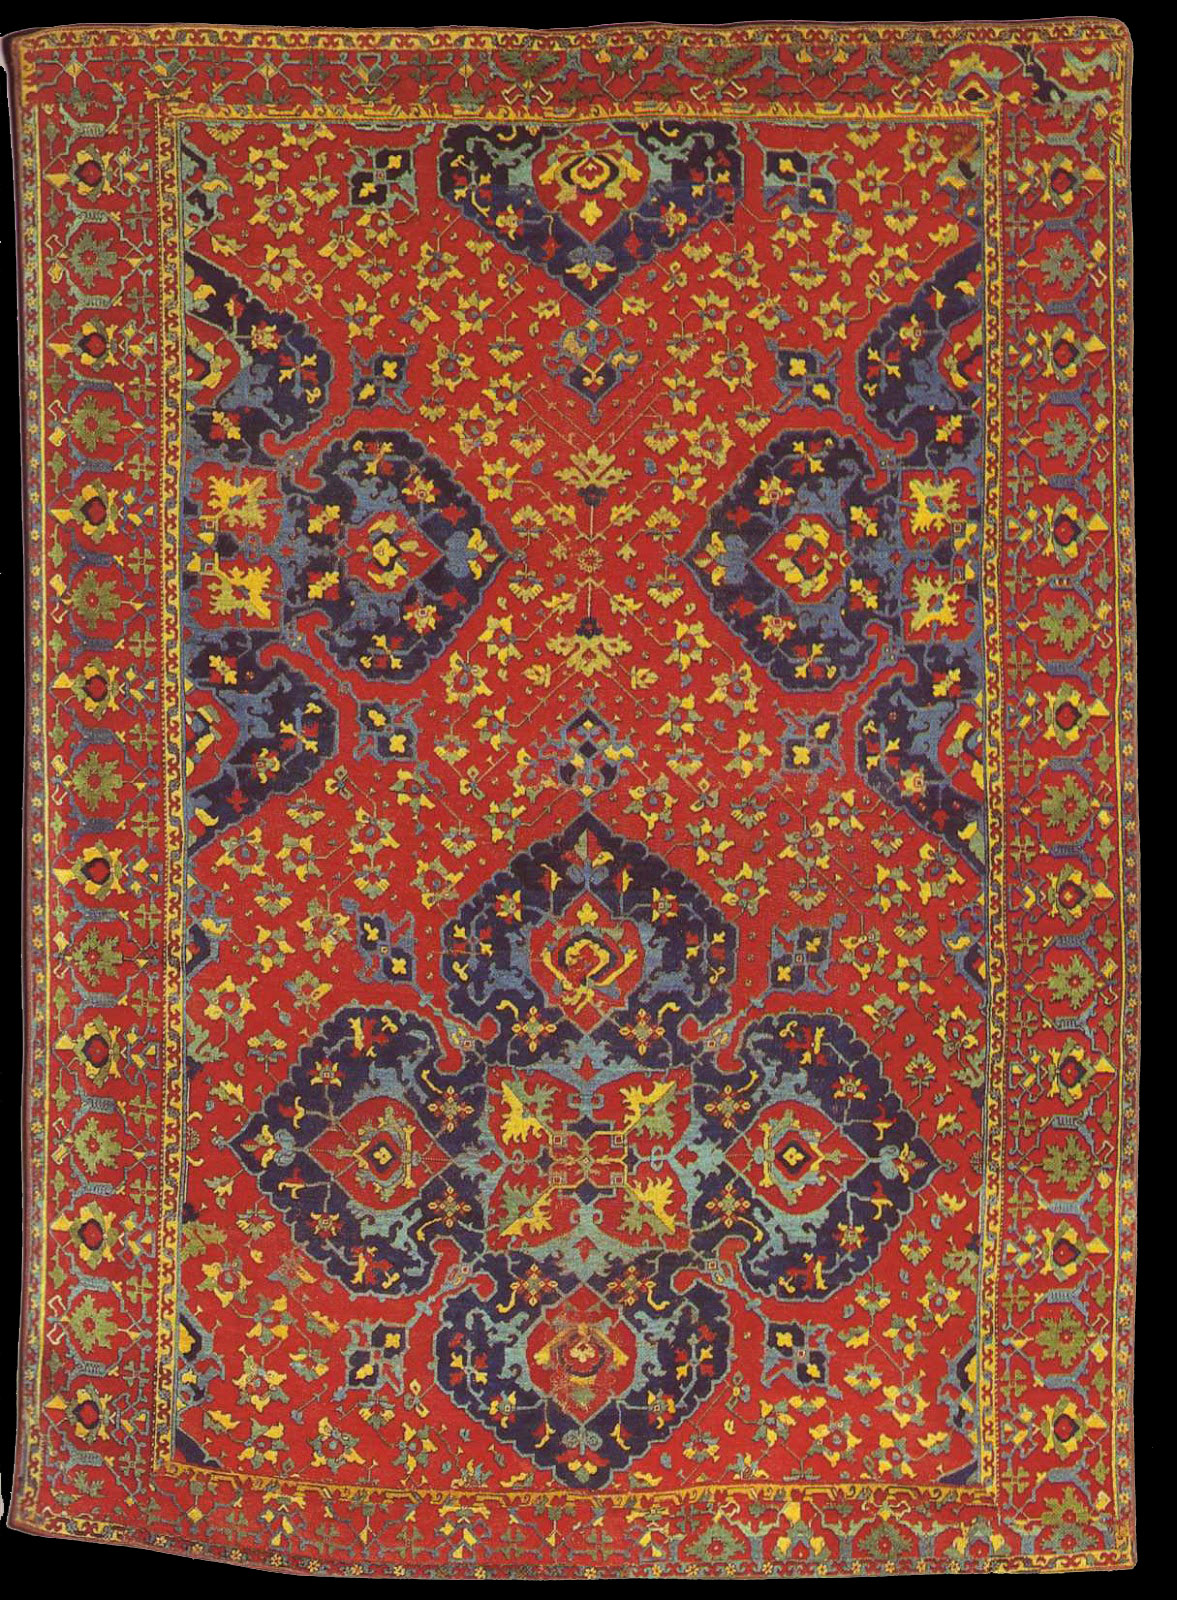 Medallion Rug Variant Star Ushak Style Ottoman Period